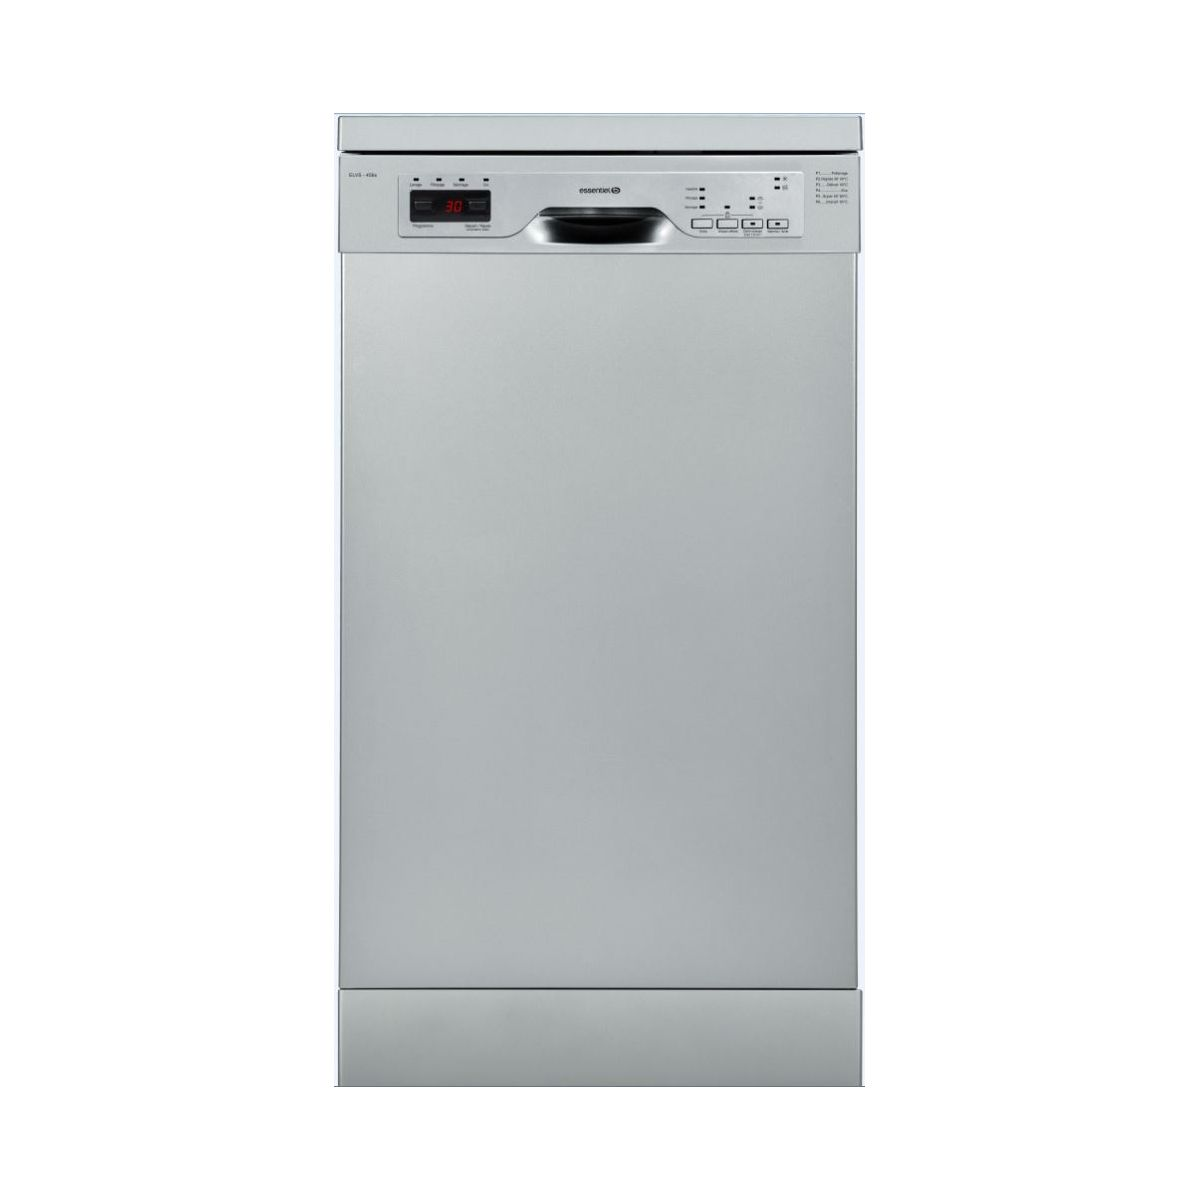 Lave vaisselle 45 cm ESSENTIELB ELVS-456s